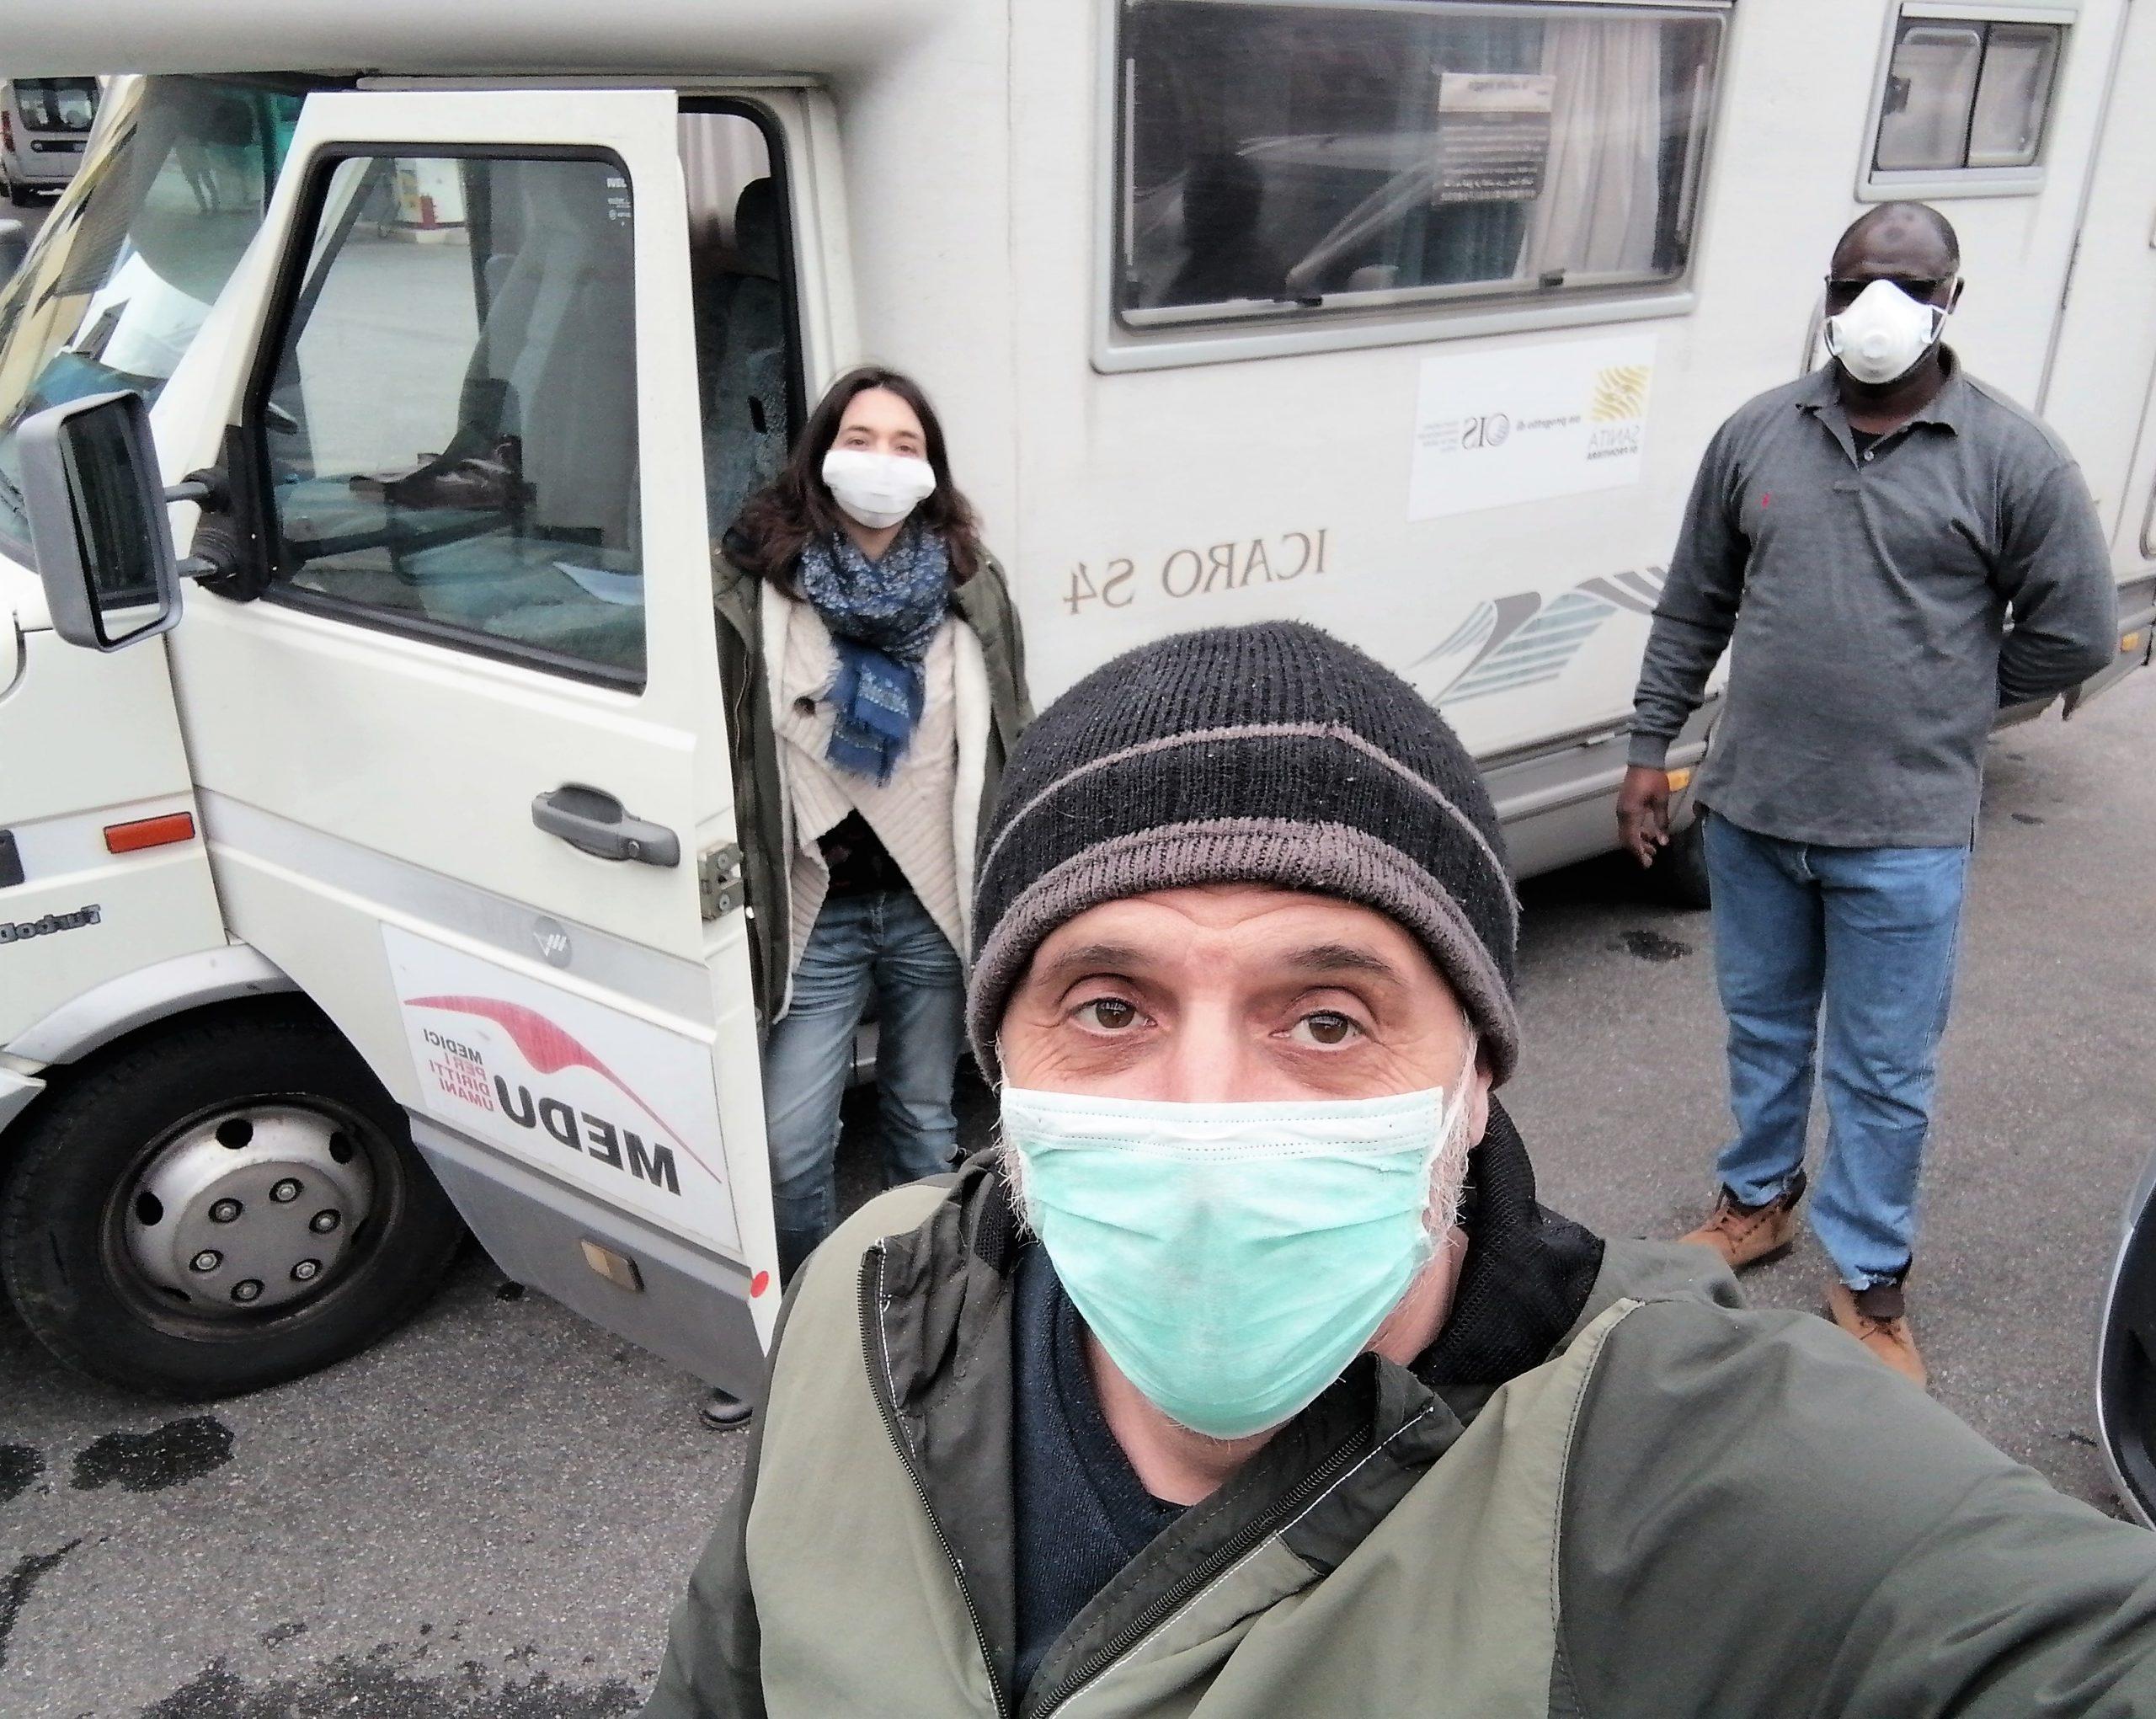 Italy refugee camp April 2020